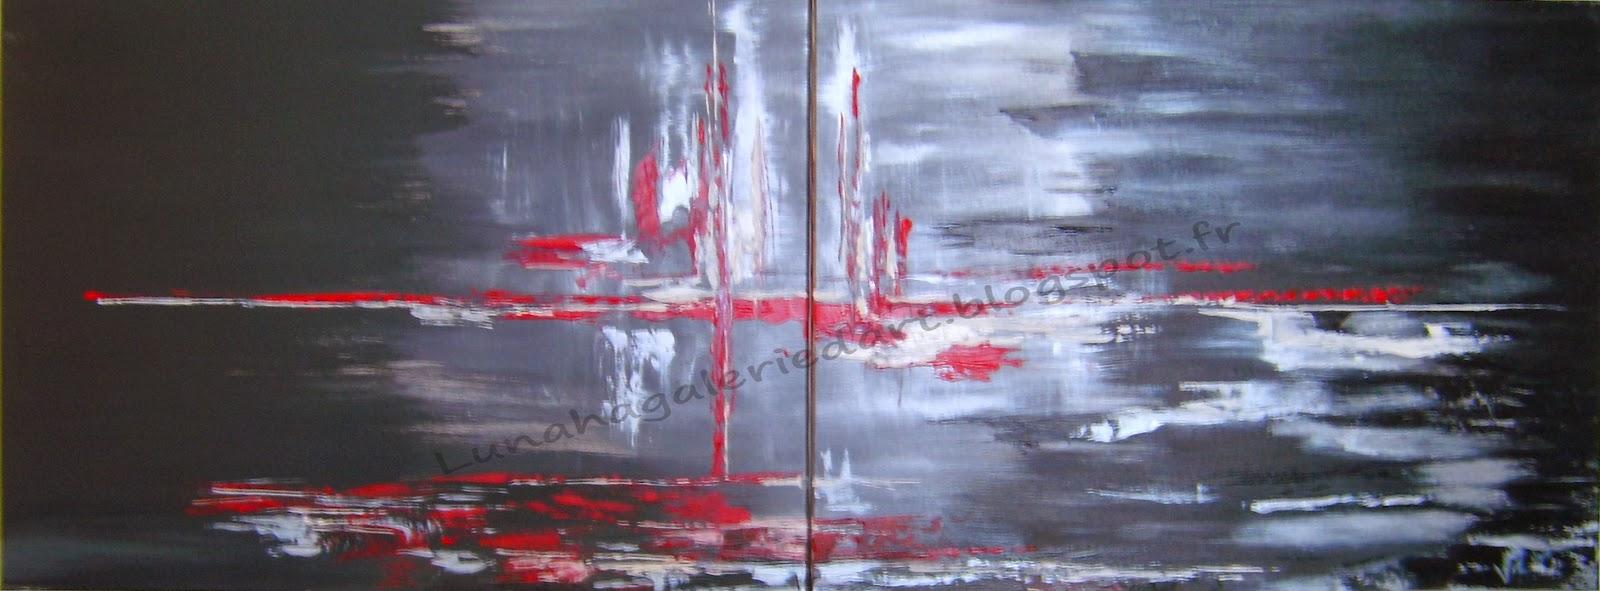 Assez LUNAHA GALERIE Artiste Peintre: GALERIE Peinture /Abstrait  WJ93